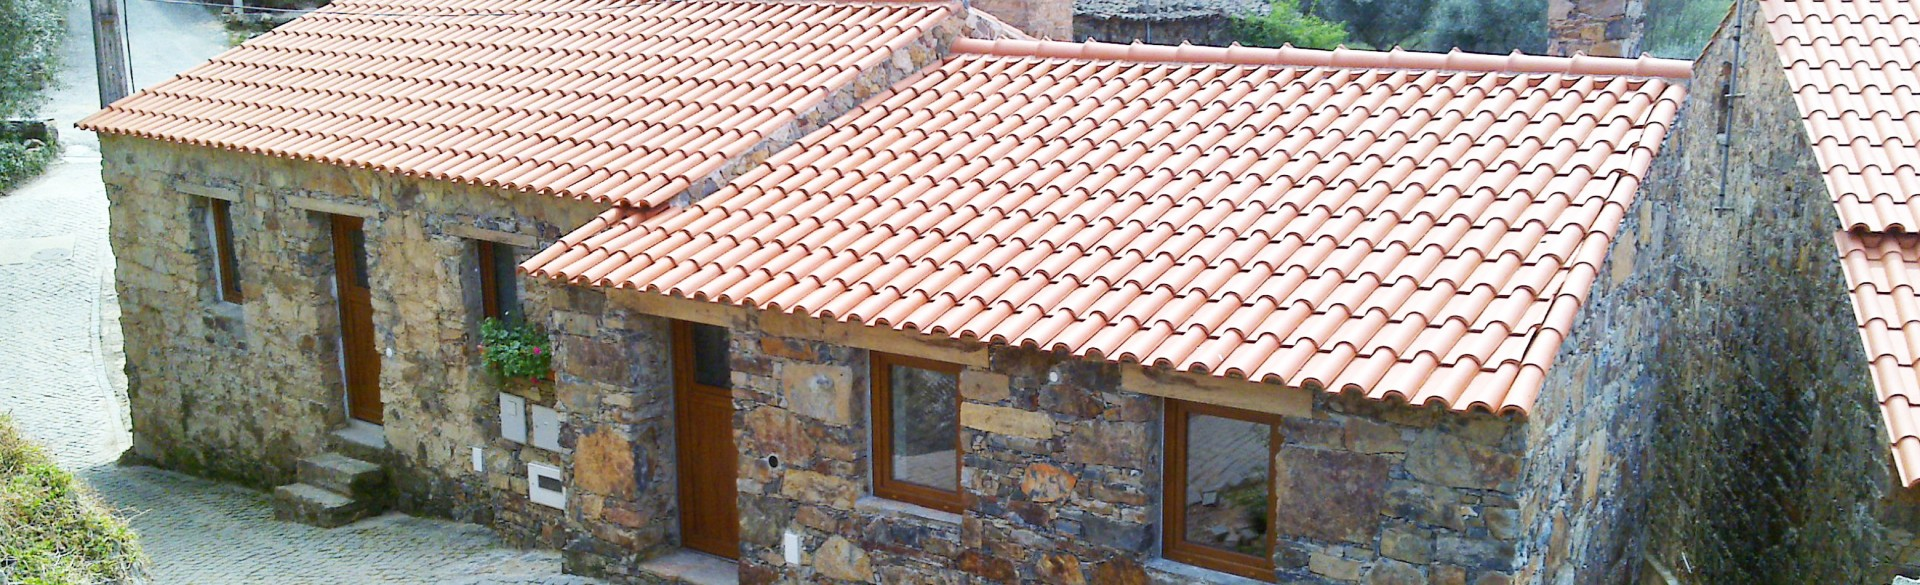 Casa da Laje – Casas de Água Formosa